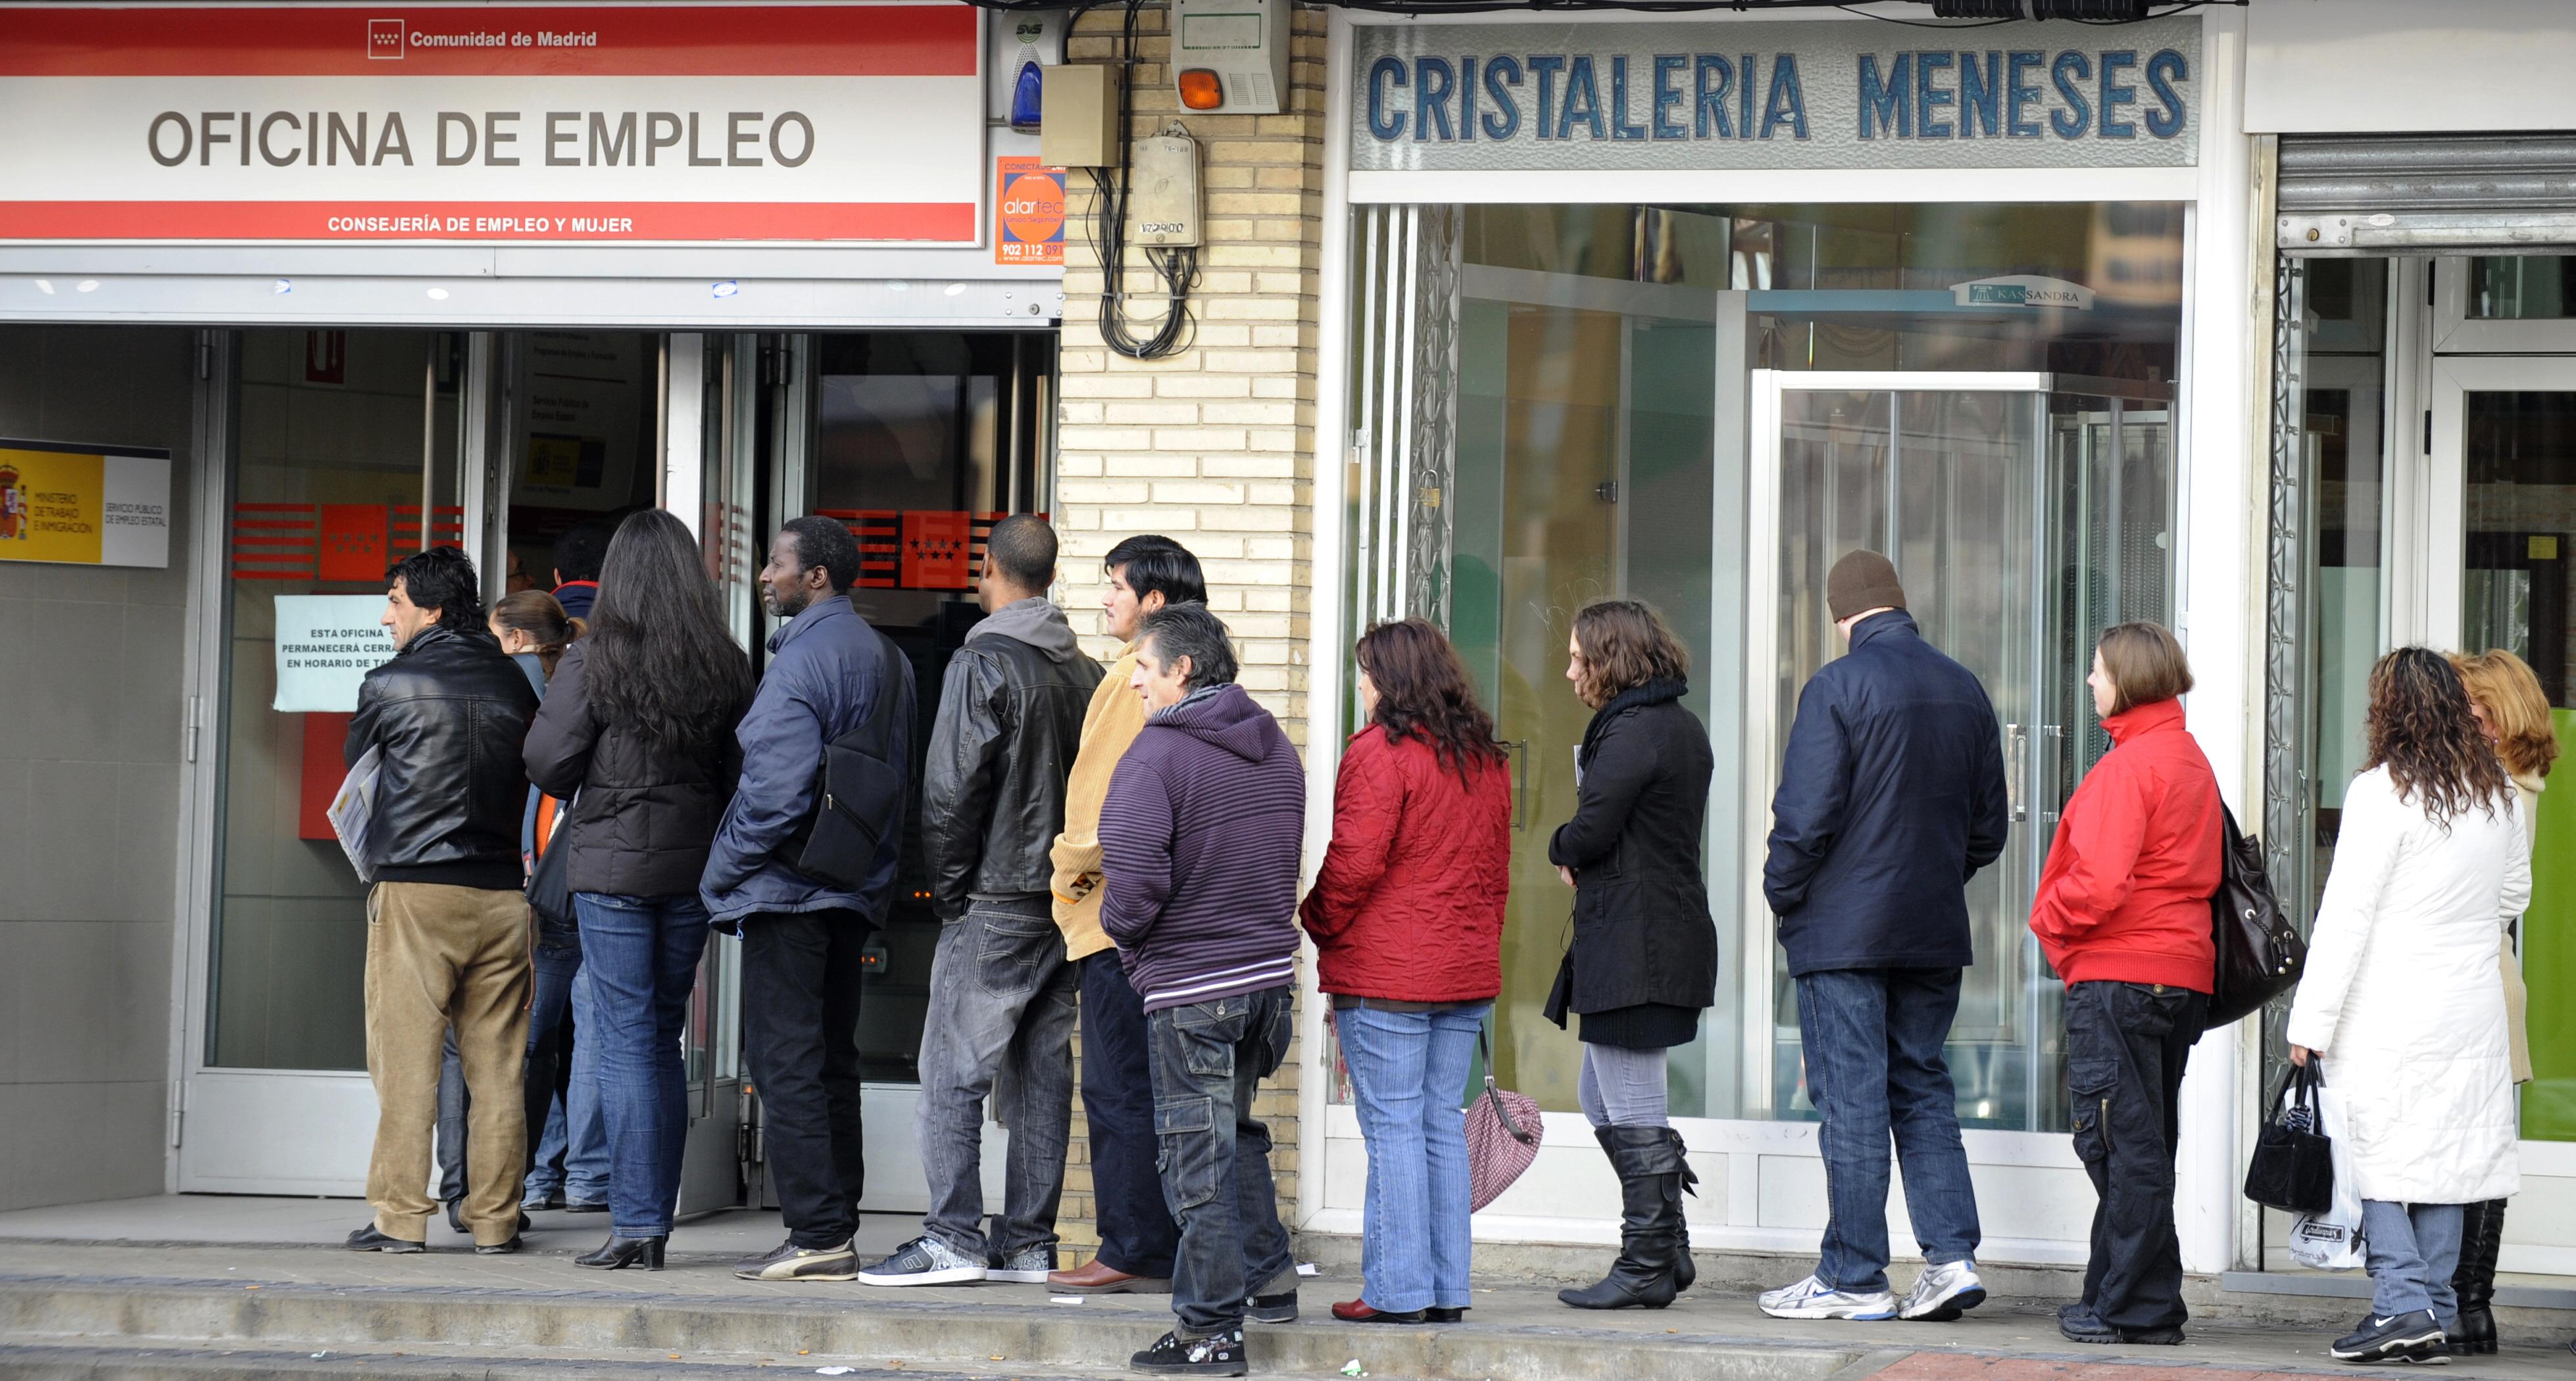 Registra desempleo ligera baja en marzo